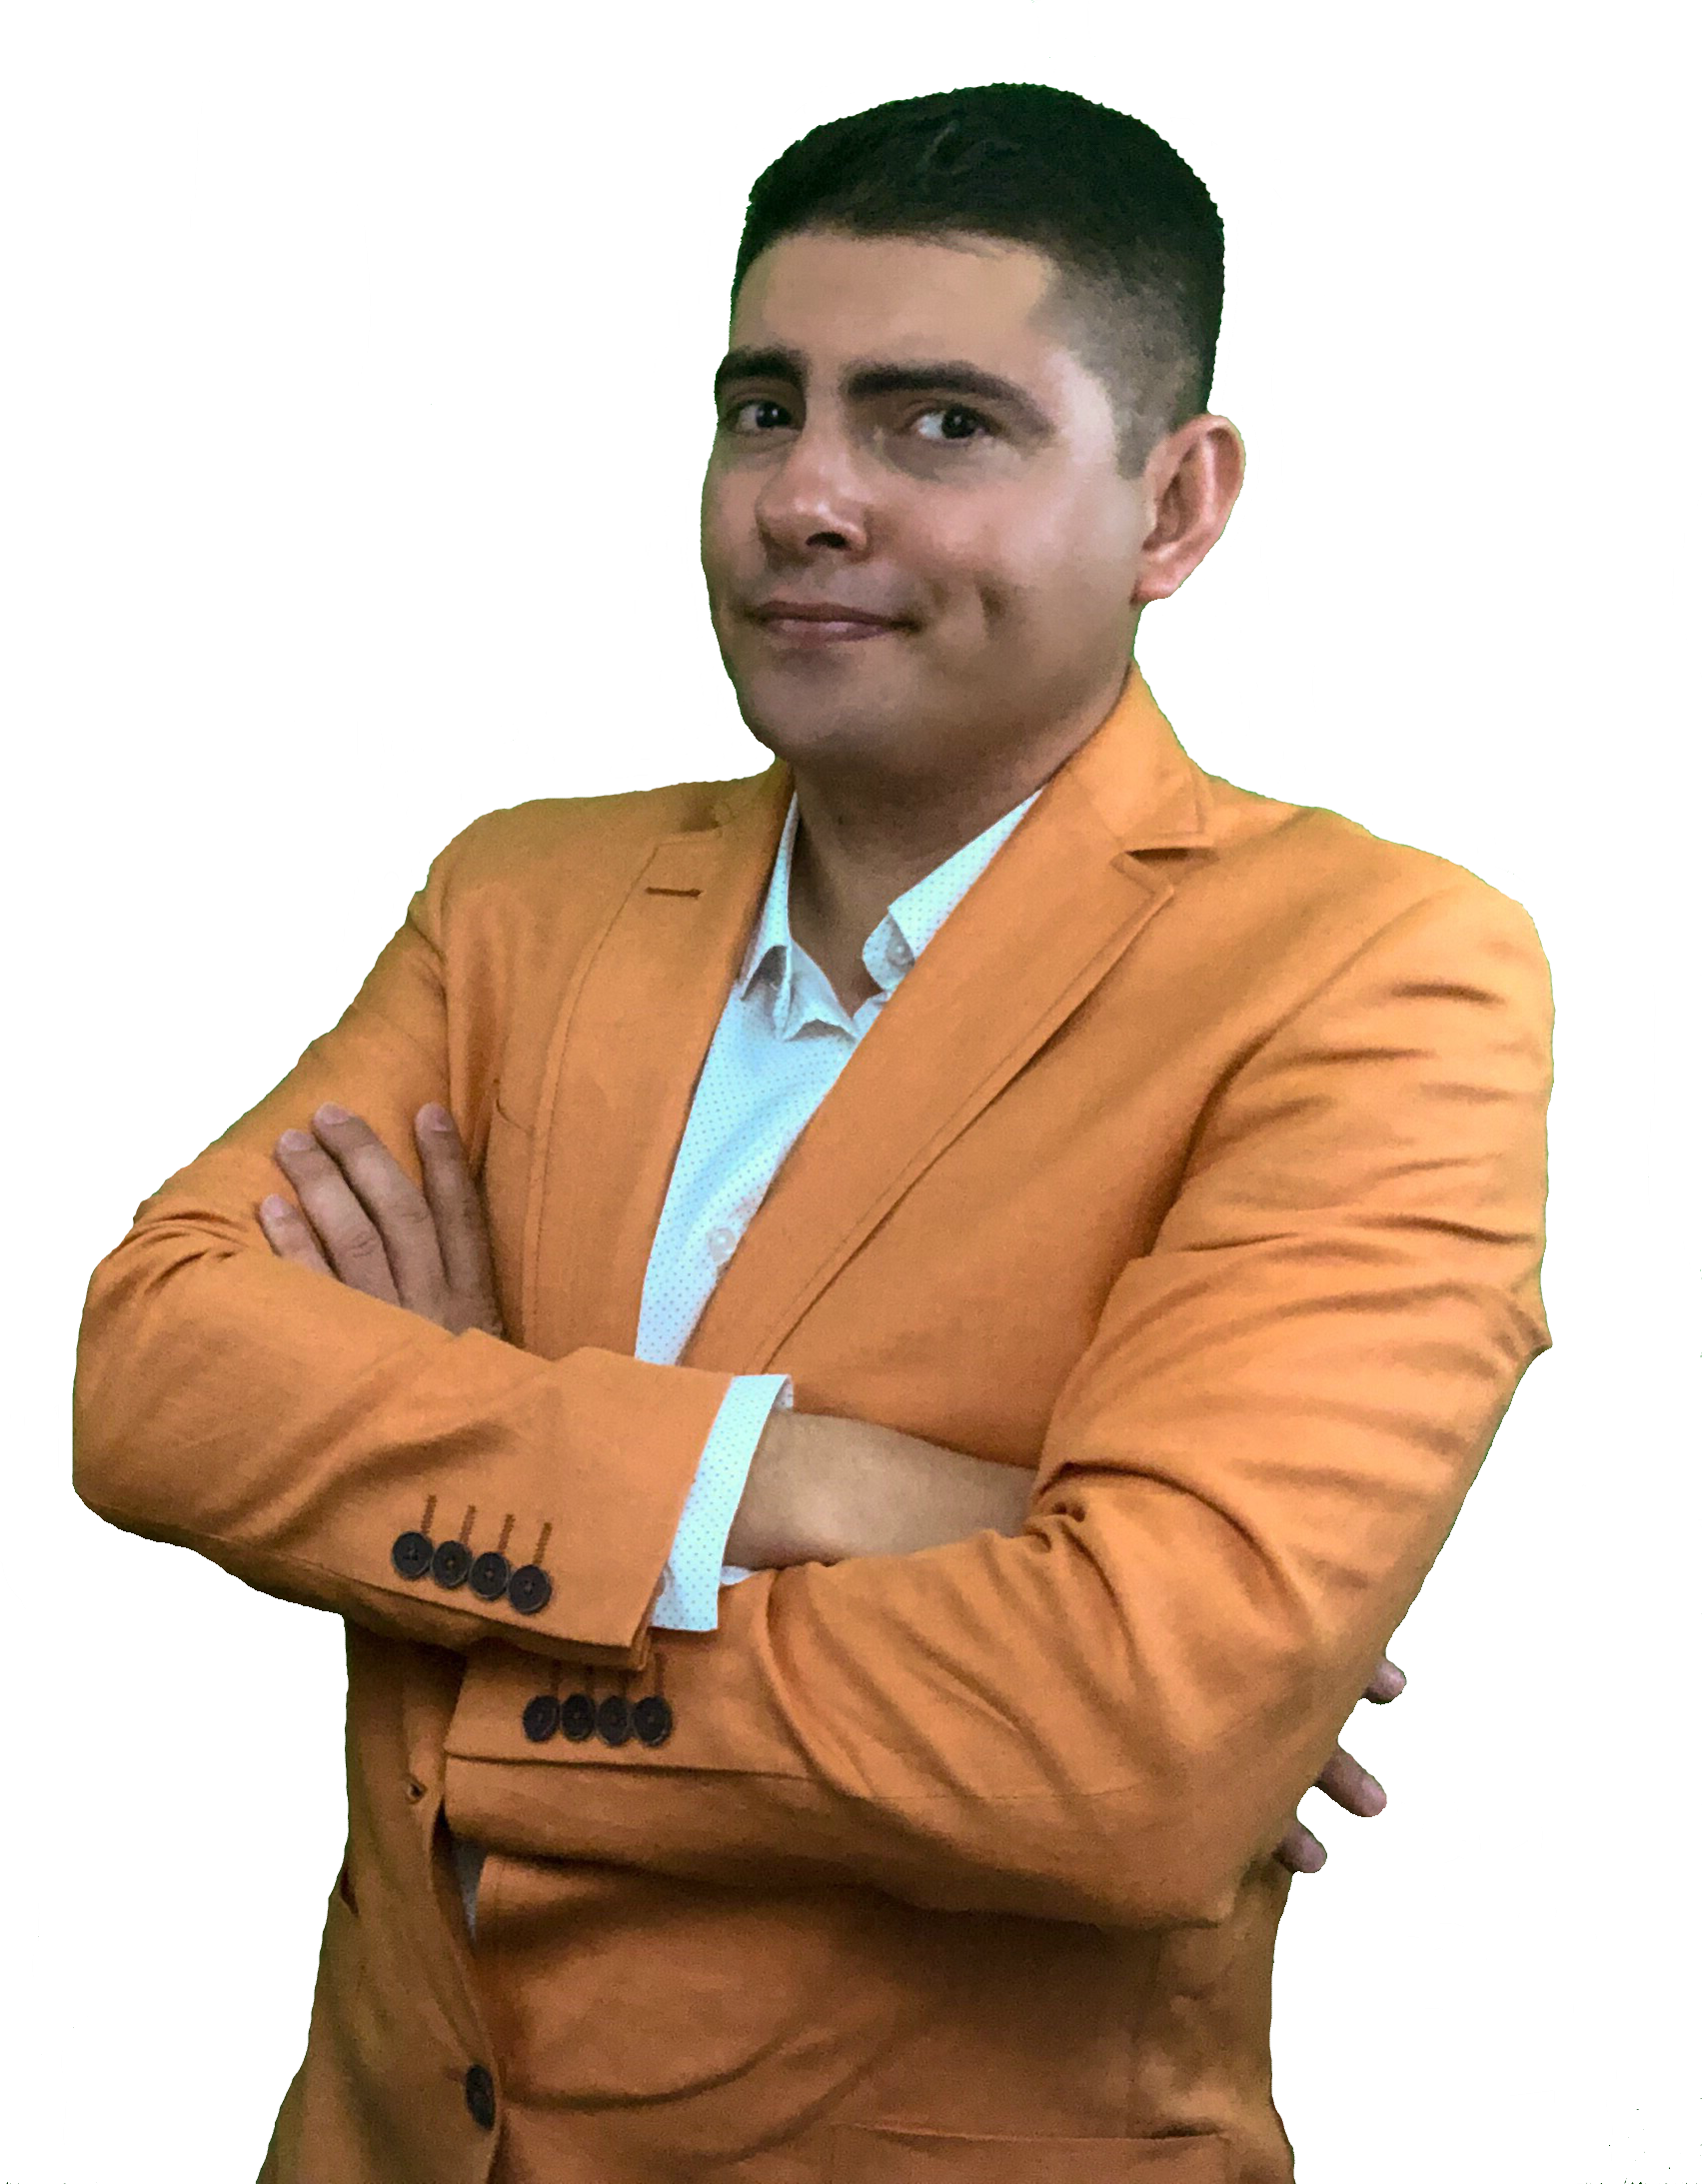 Fabian Razo